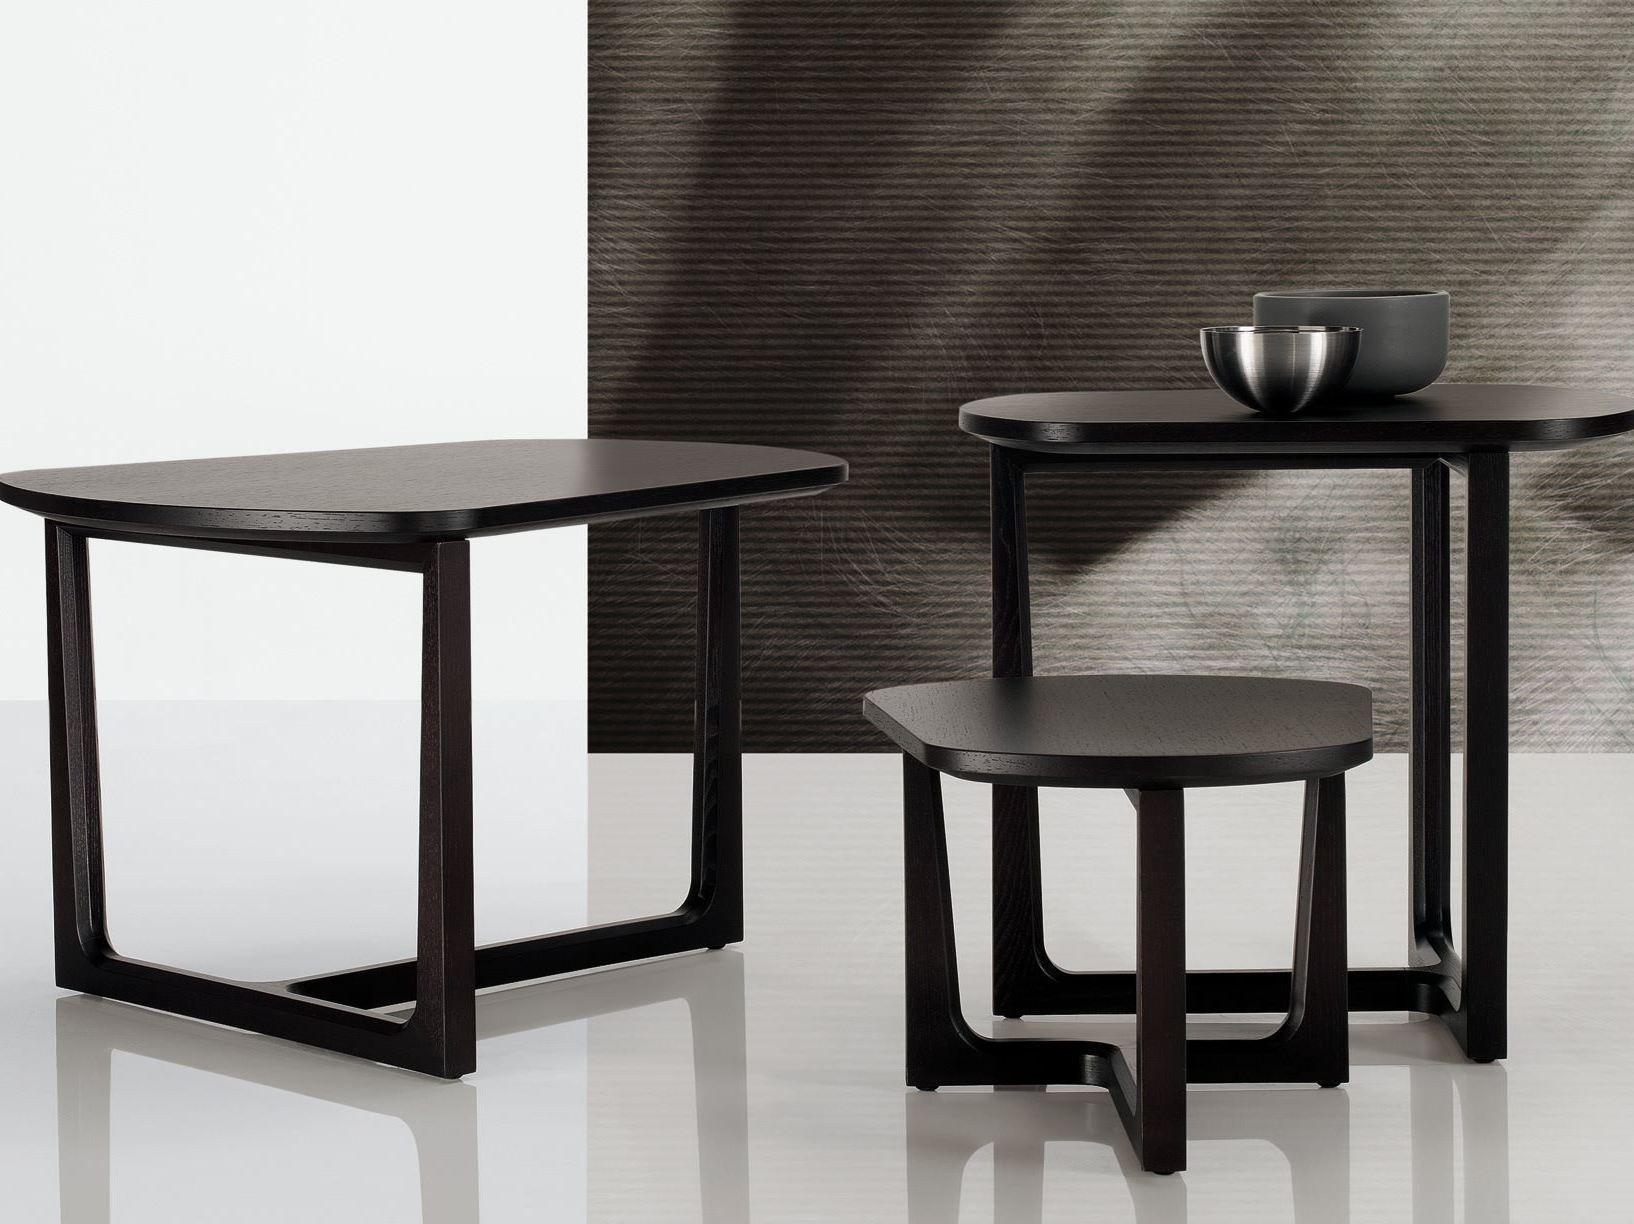 Home products chairs ics ipsilon - Home Products Chairs Ics Ipsilon 54